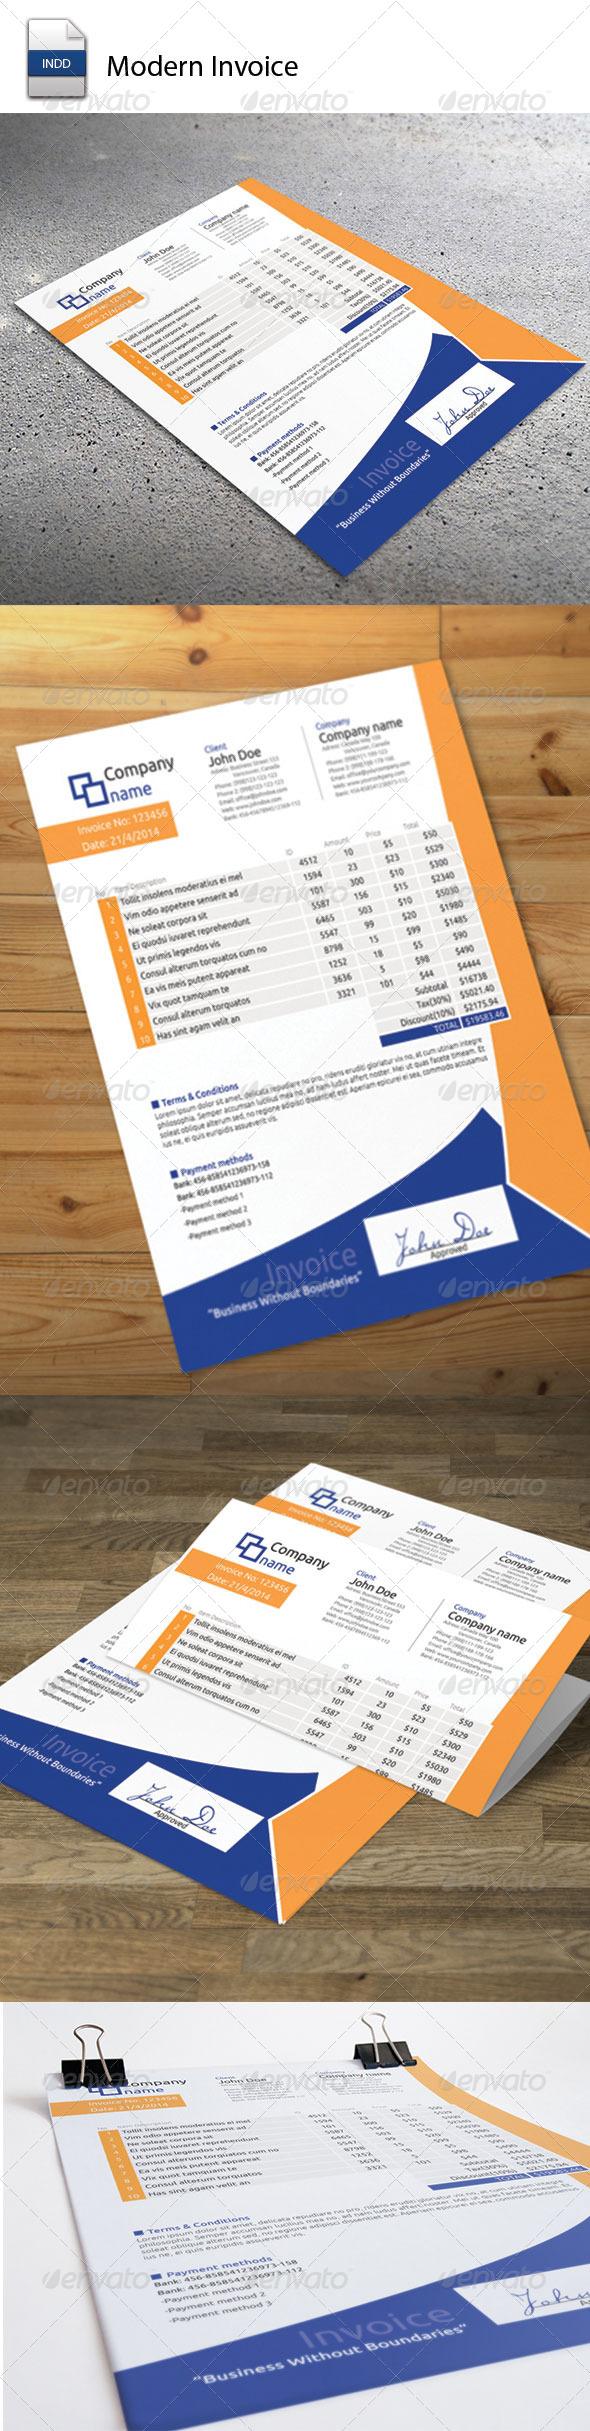 GraphicRiver Invoice Moderna 5704324